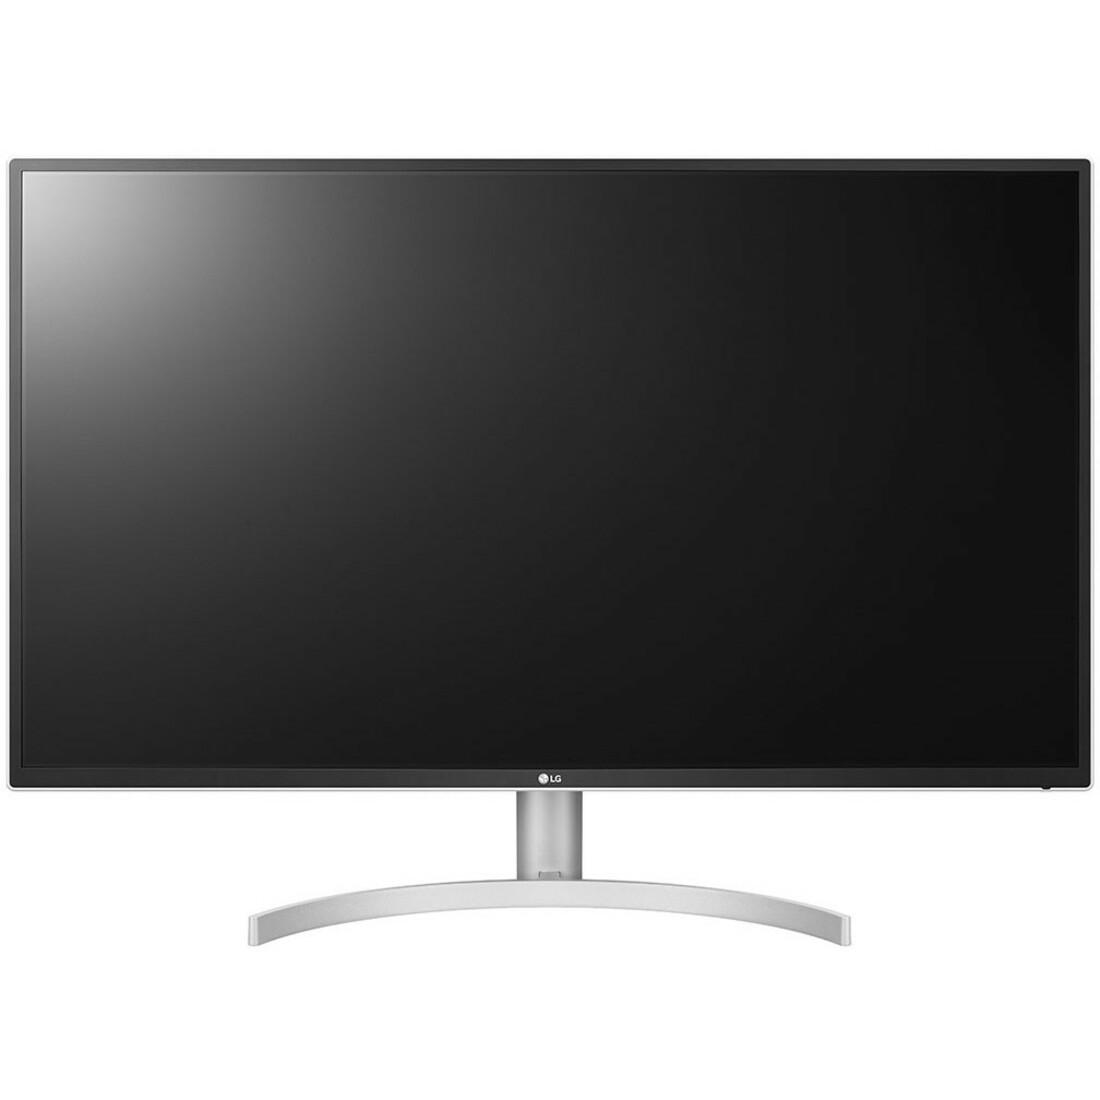 "LG 32BK50Q-WB 31.5"" WQHD LED LCD Monitor - 16:9_subImage_1"